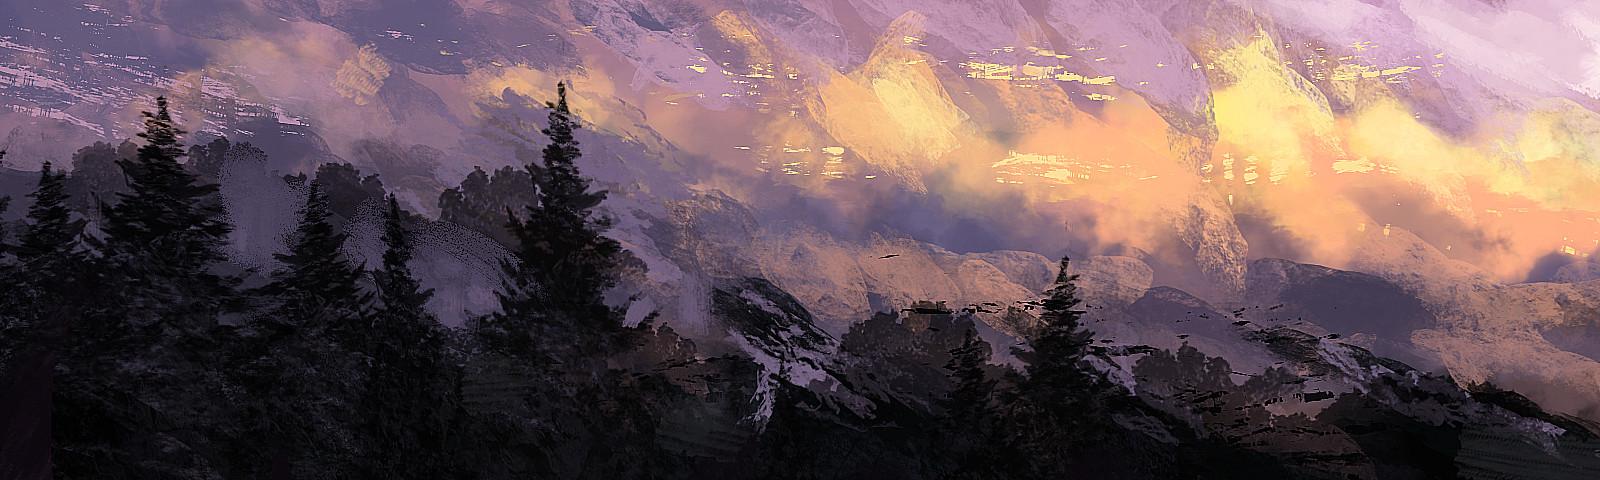 Benjamin bardou 161117 montagnes